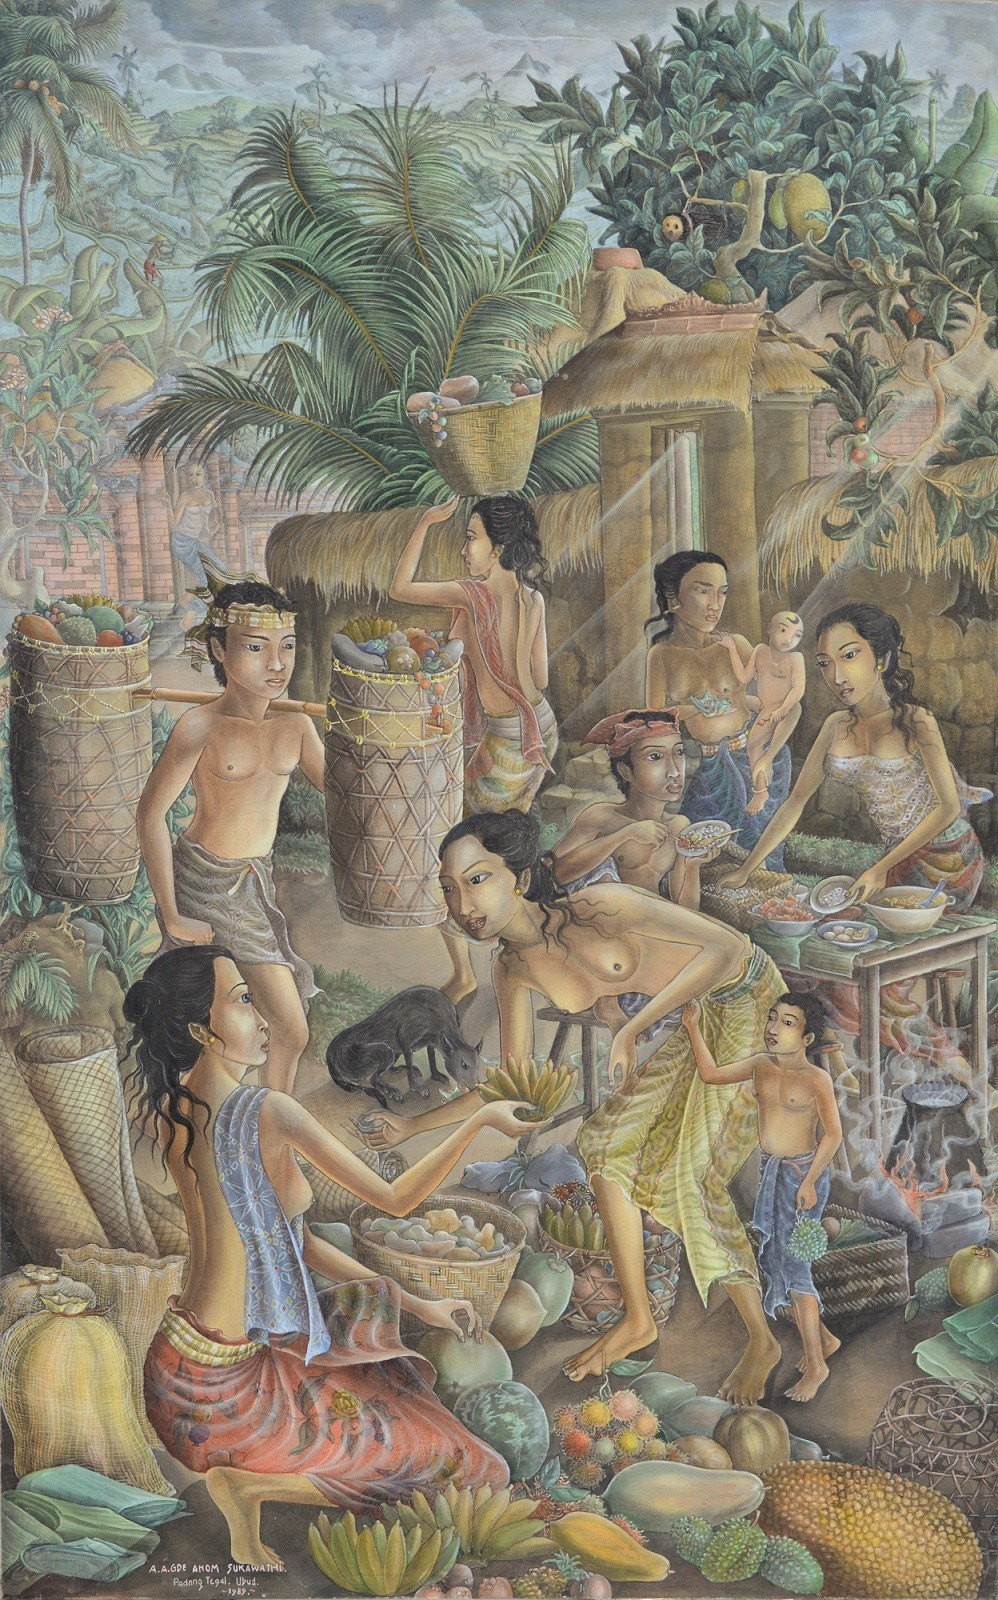 Lot #564 'Suasana Pasar' by Anak Agung Gde Anom Sukawati.